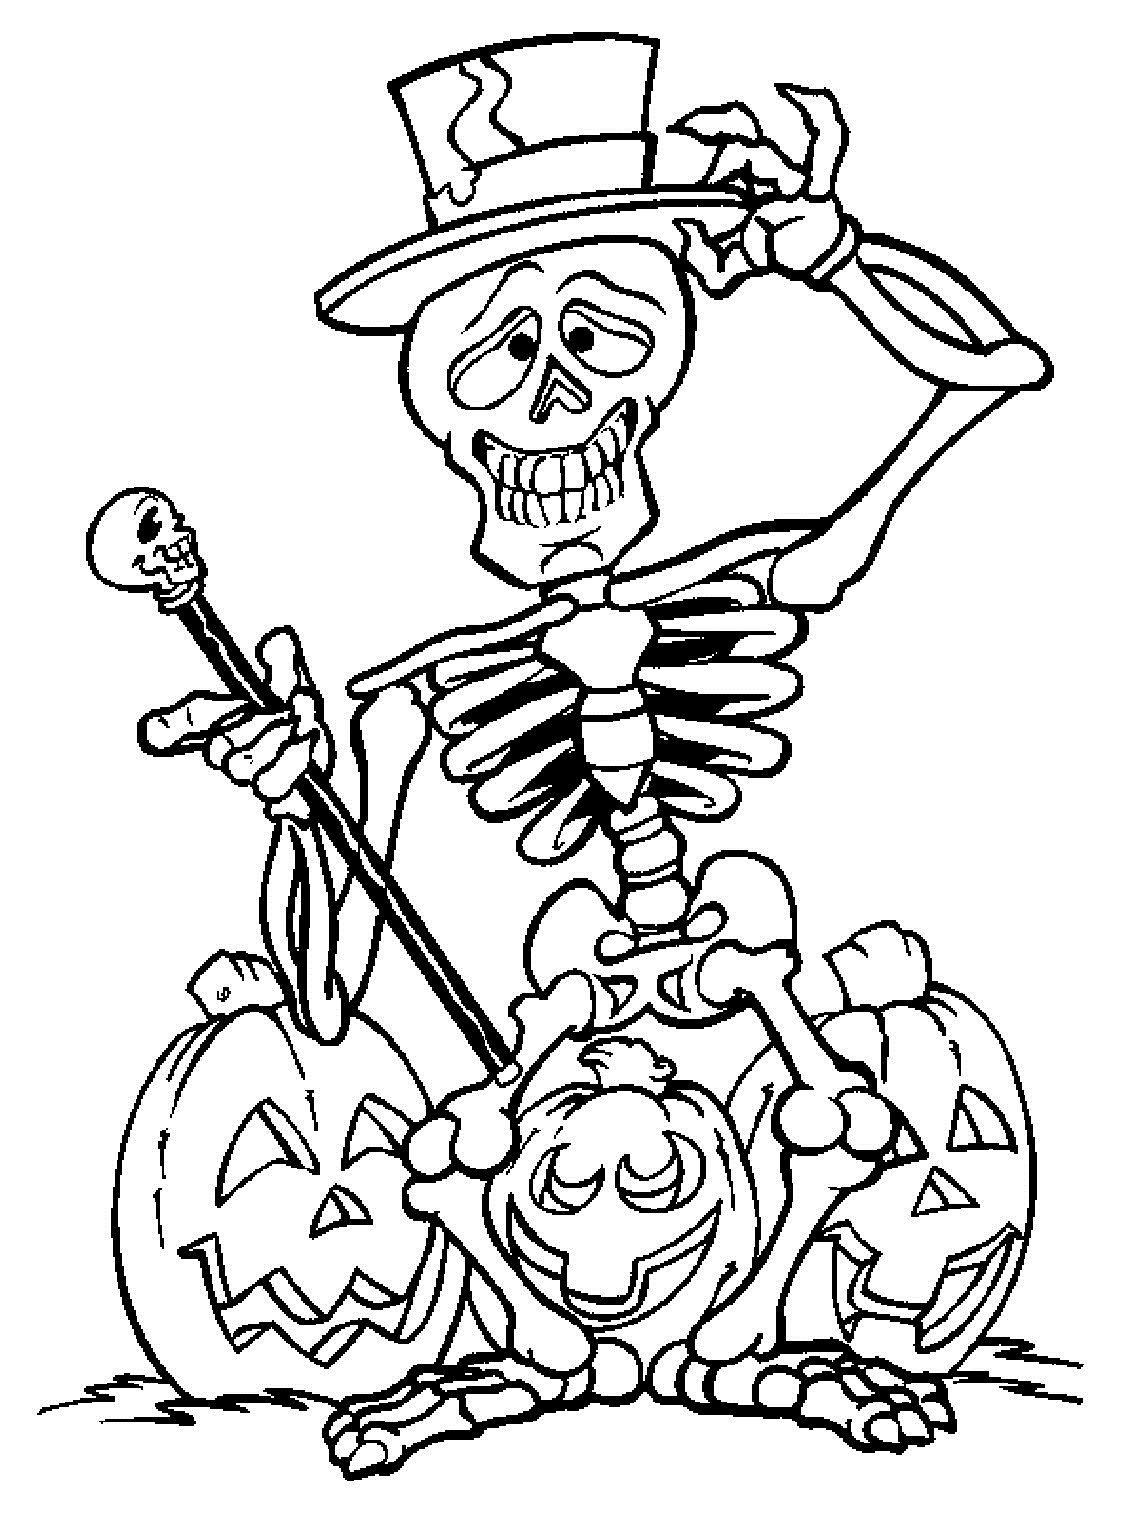 Хэллоуин и скелет - razukrashki.com | Halloween coloring pages ...